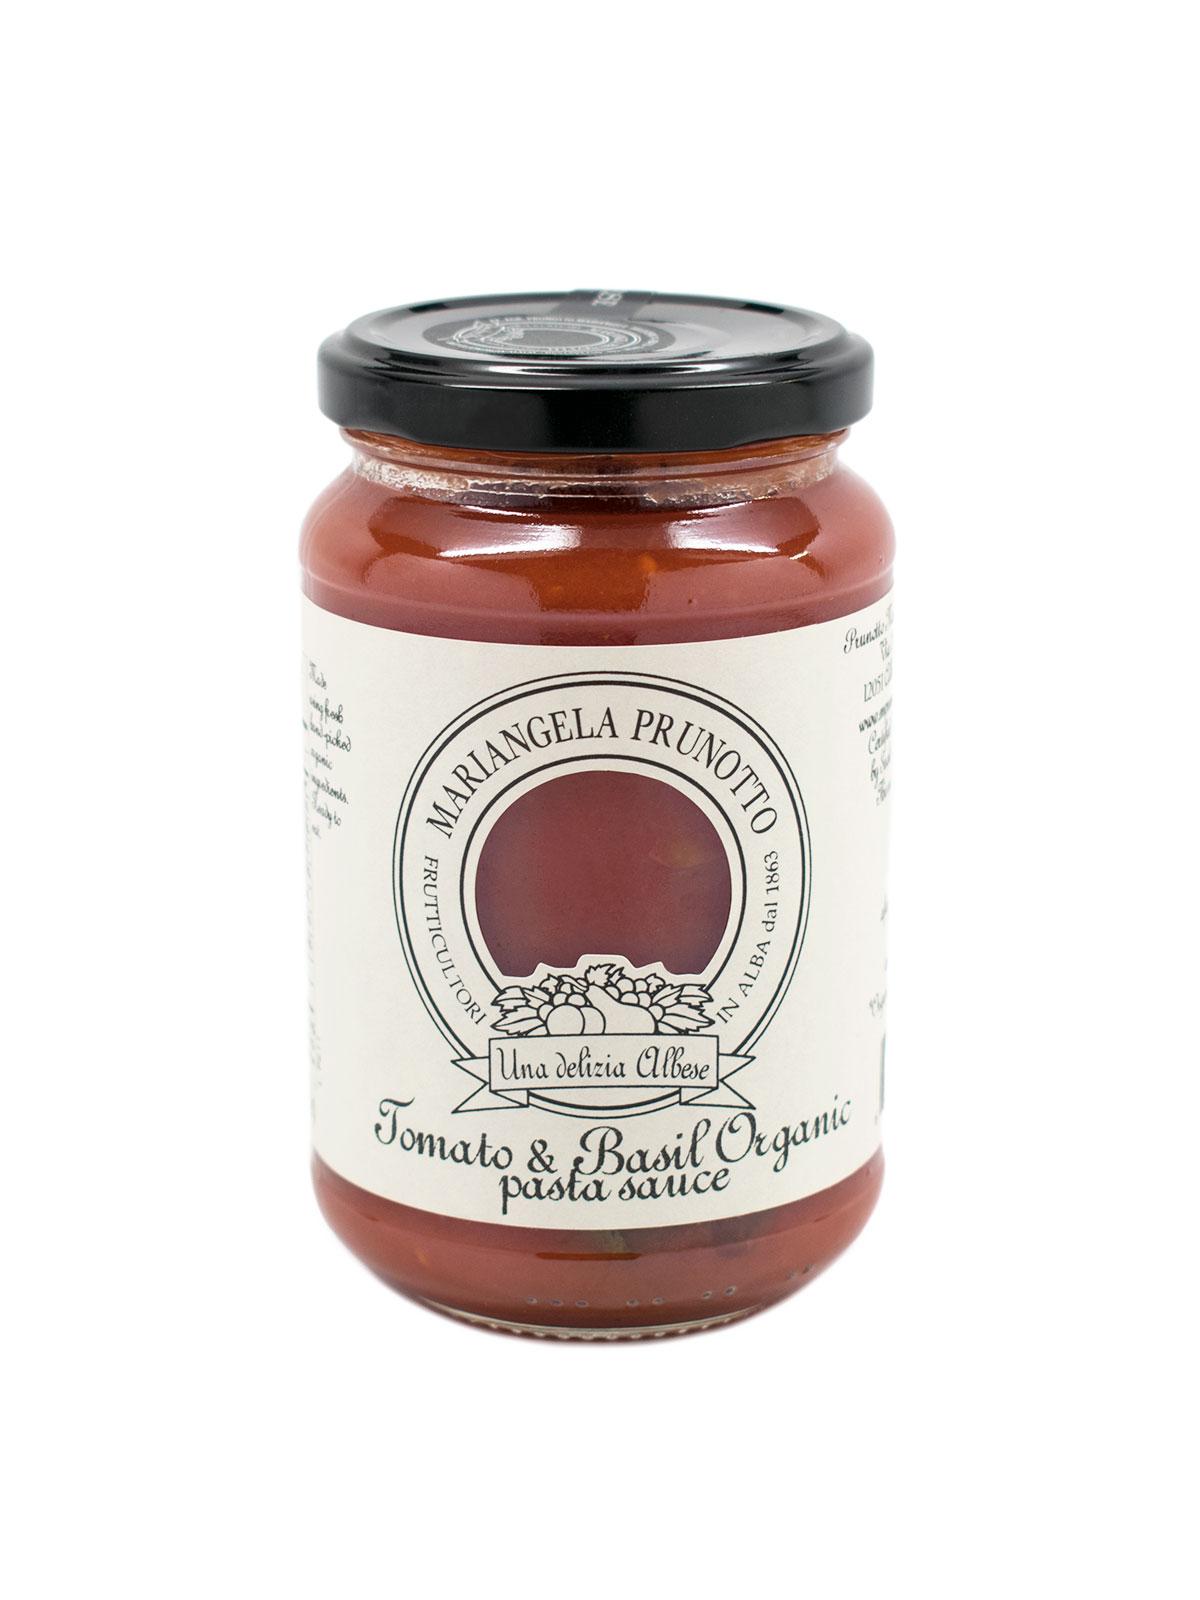 Organic Tomato and Basil Pasta Sauce - Pantry - Buon'Italia